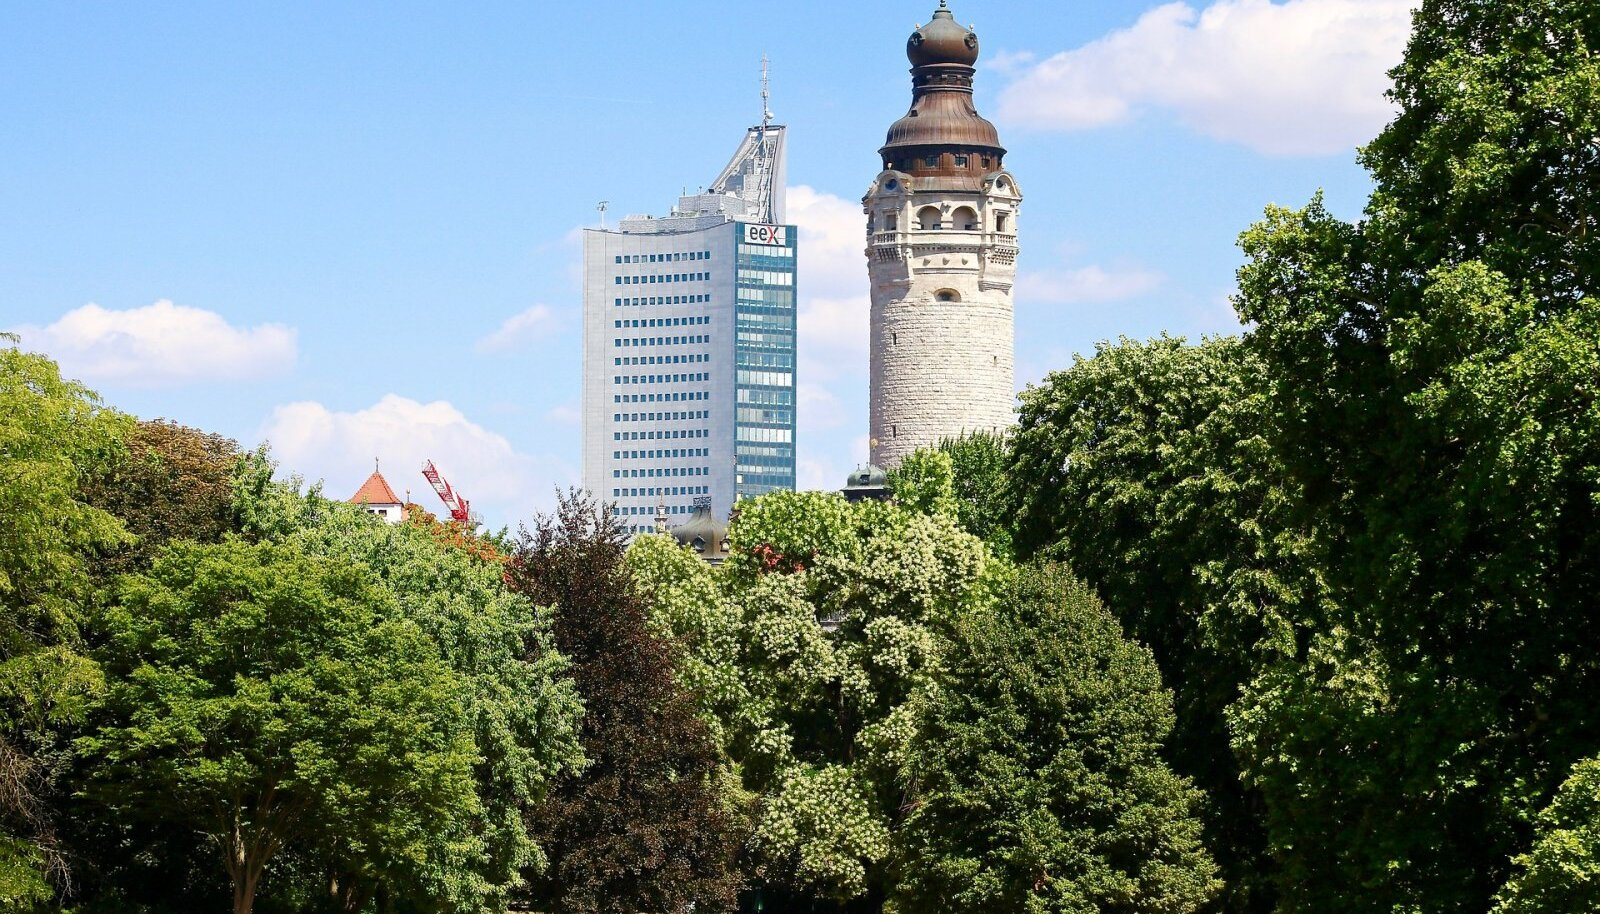 Leipzigis kasvavad puud (Foto: Pixabay / scholacantorum)